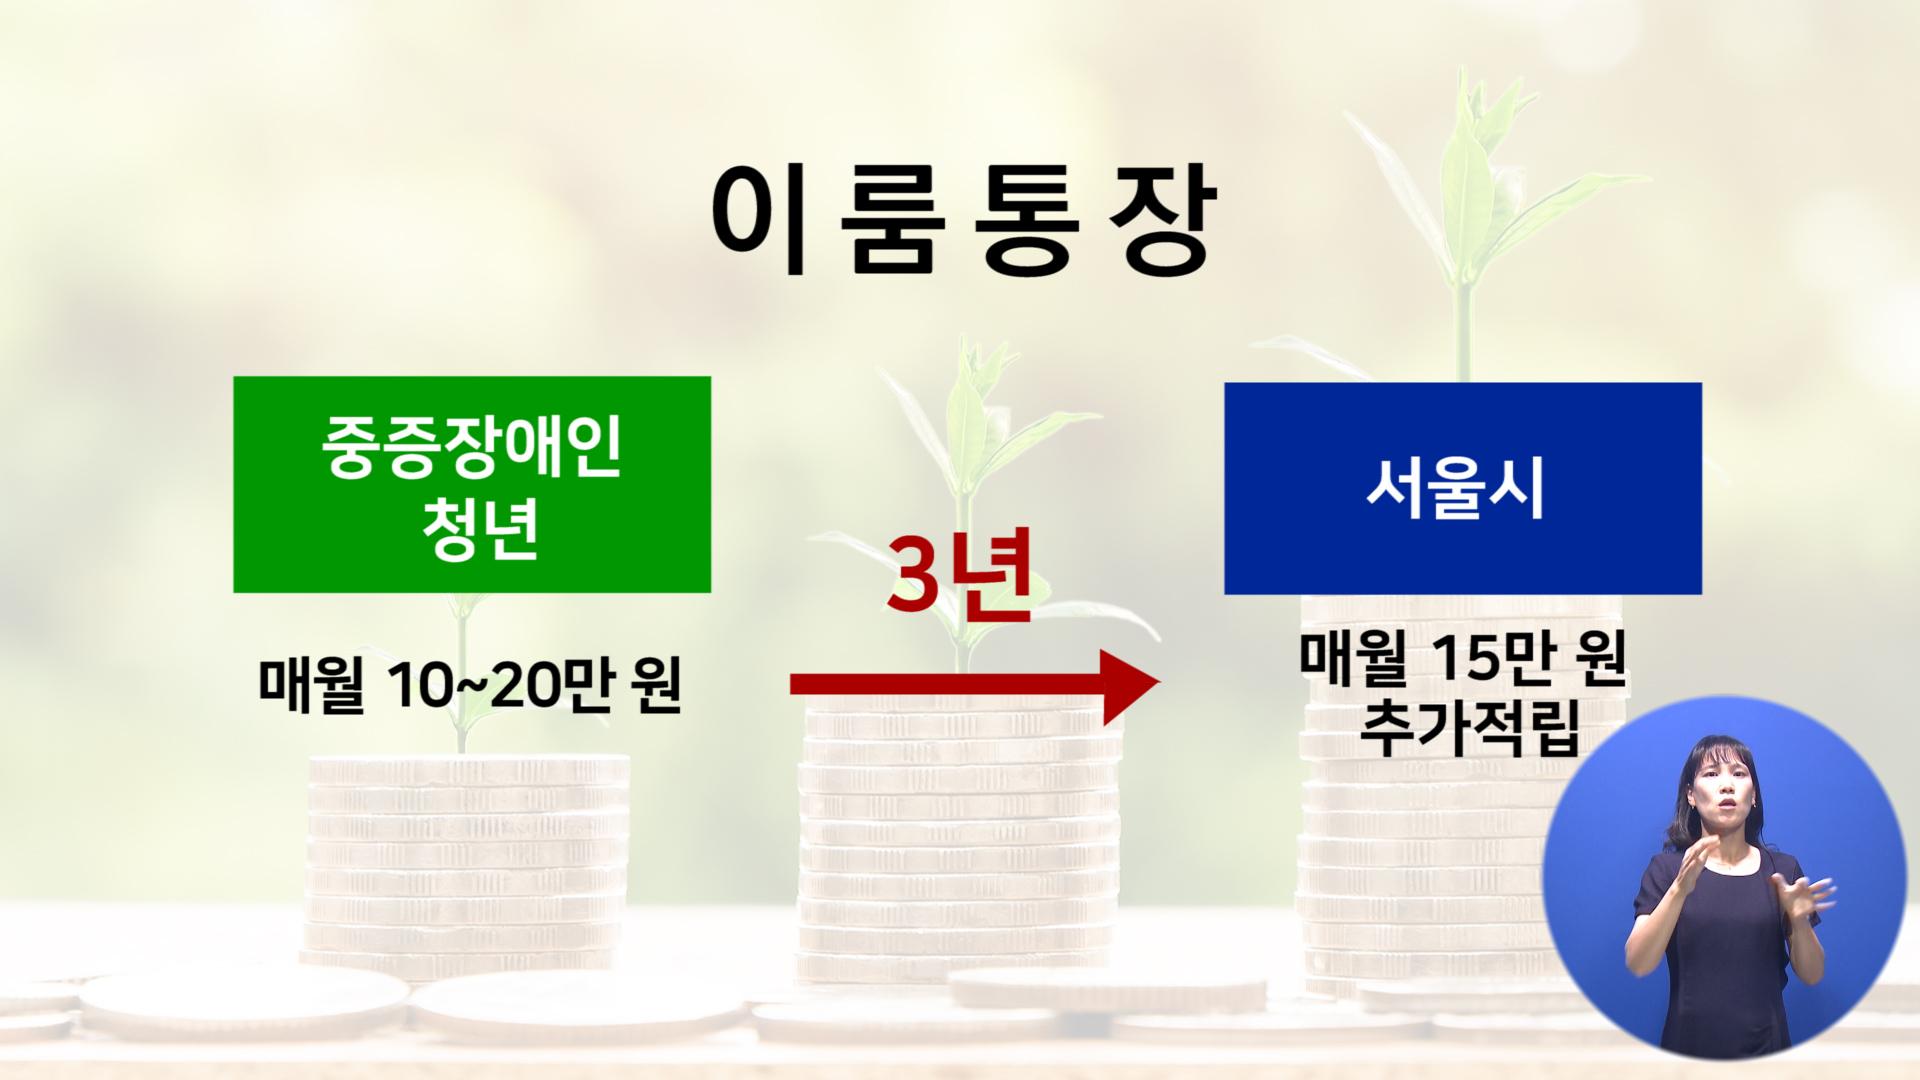 http://58.225.10.93/Media/EBN/EBNP0025/서울시중증장애인이룸통장약정식.Still029.jpg